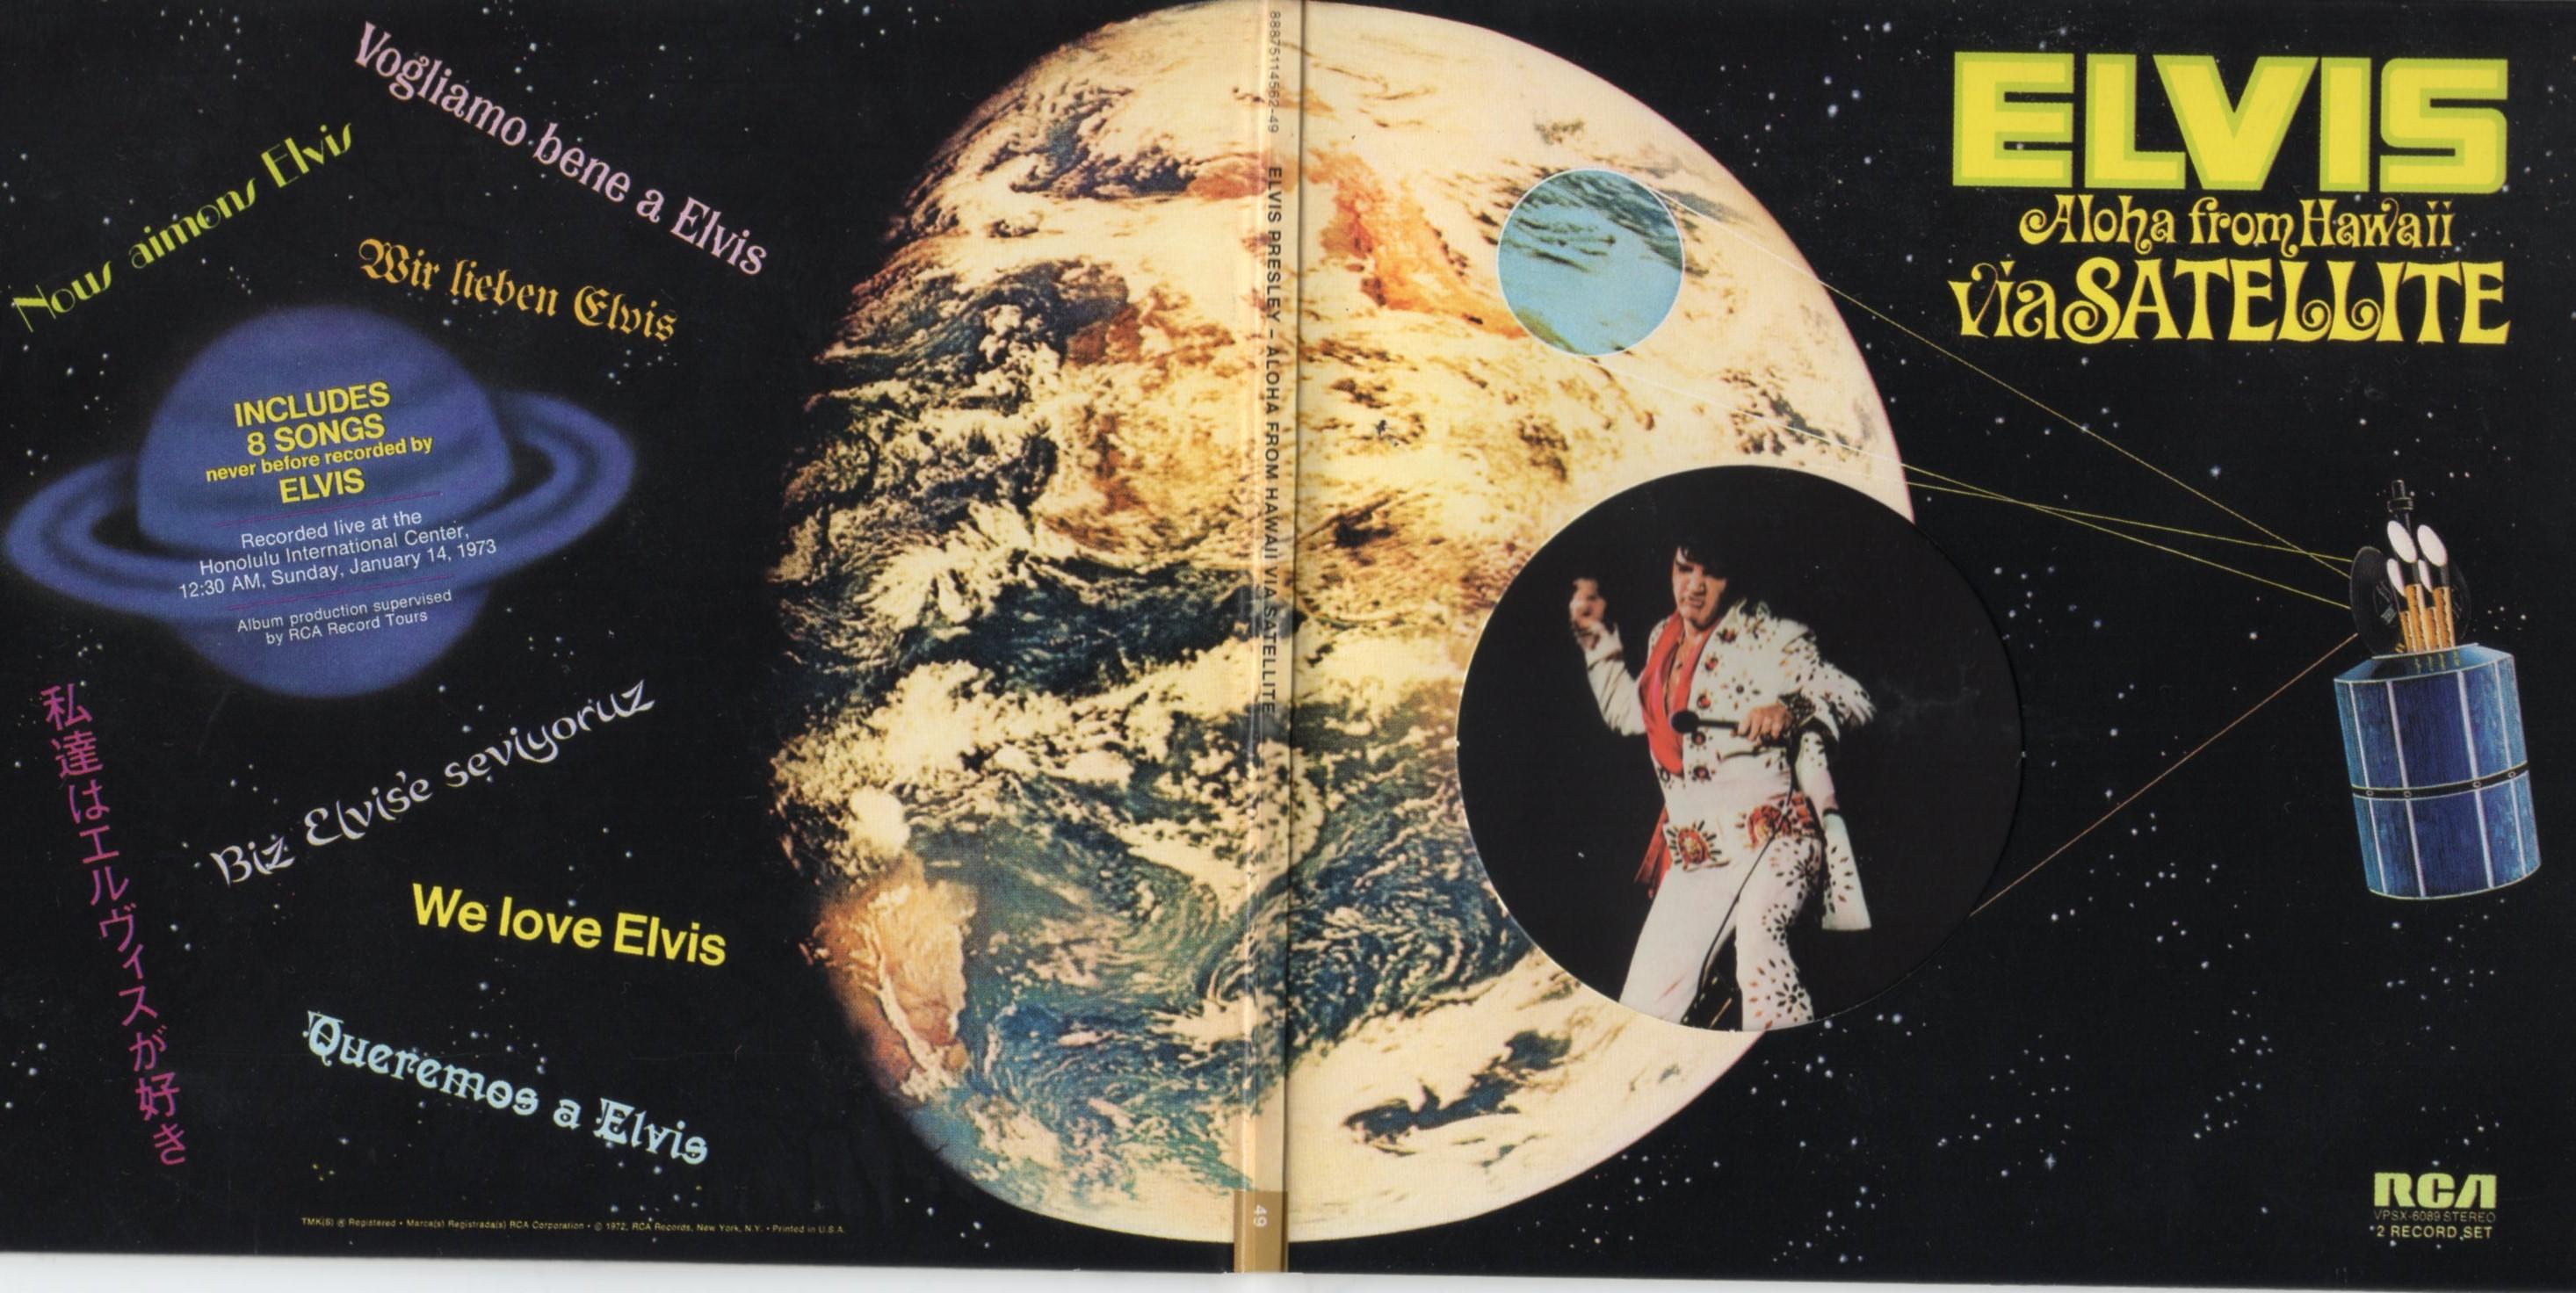 Elvis PRESLEY - Aloha From Hawaii Via Satellite (1973 - Mini Lp Gatefold Replica -29-track Card Sleeve)